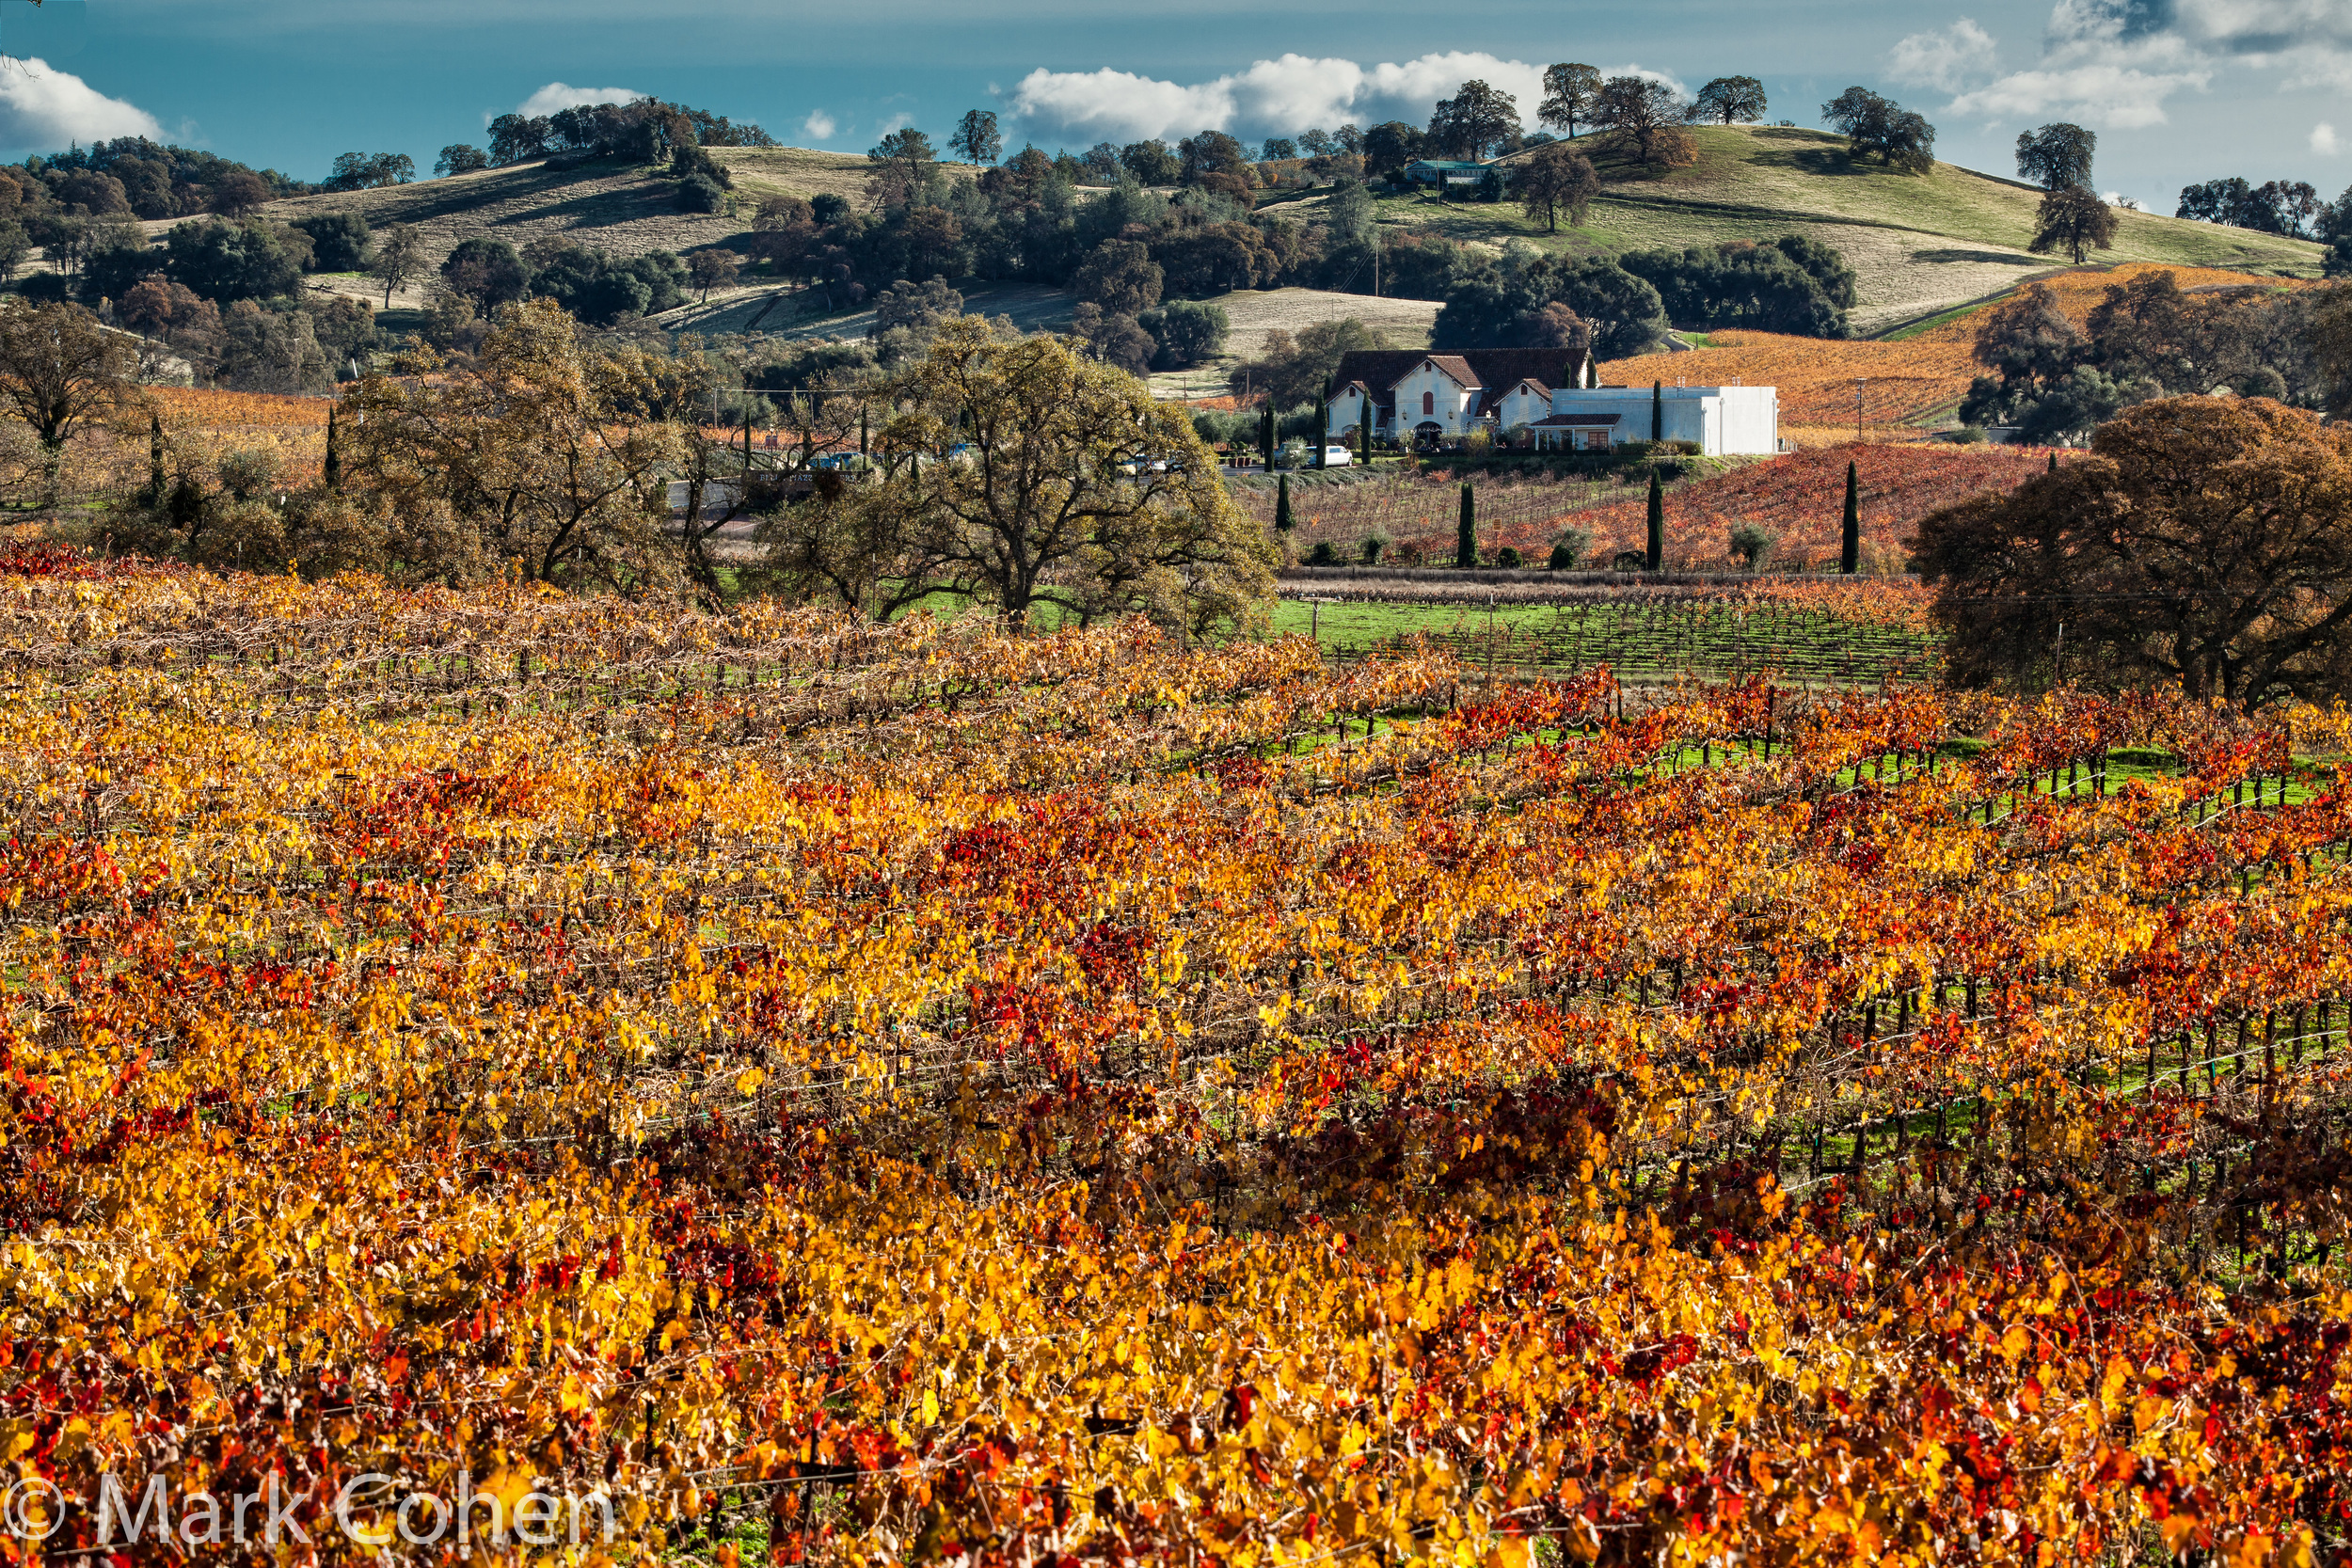 Vineyard and Bella Piazza Winery no.1, Amador County, 2014